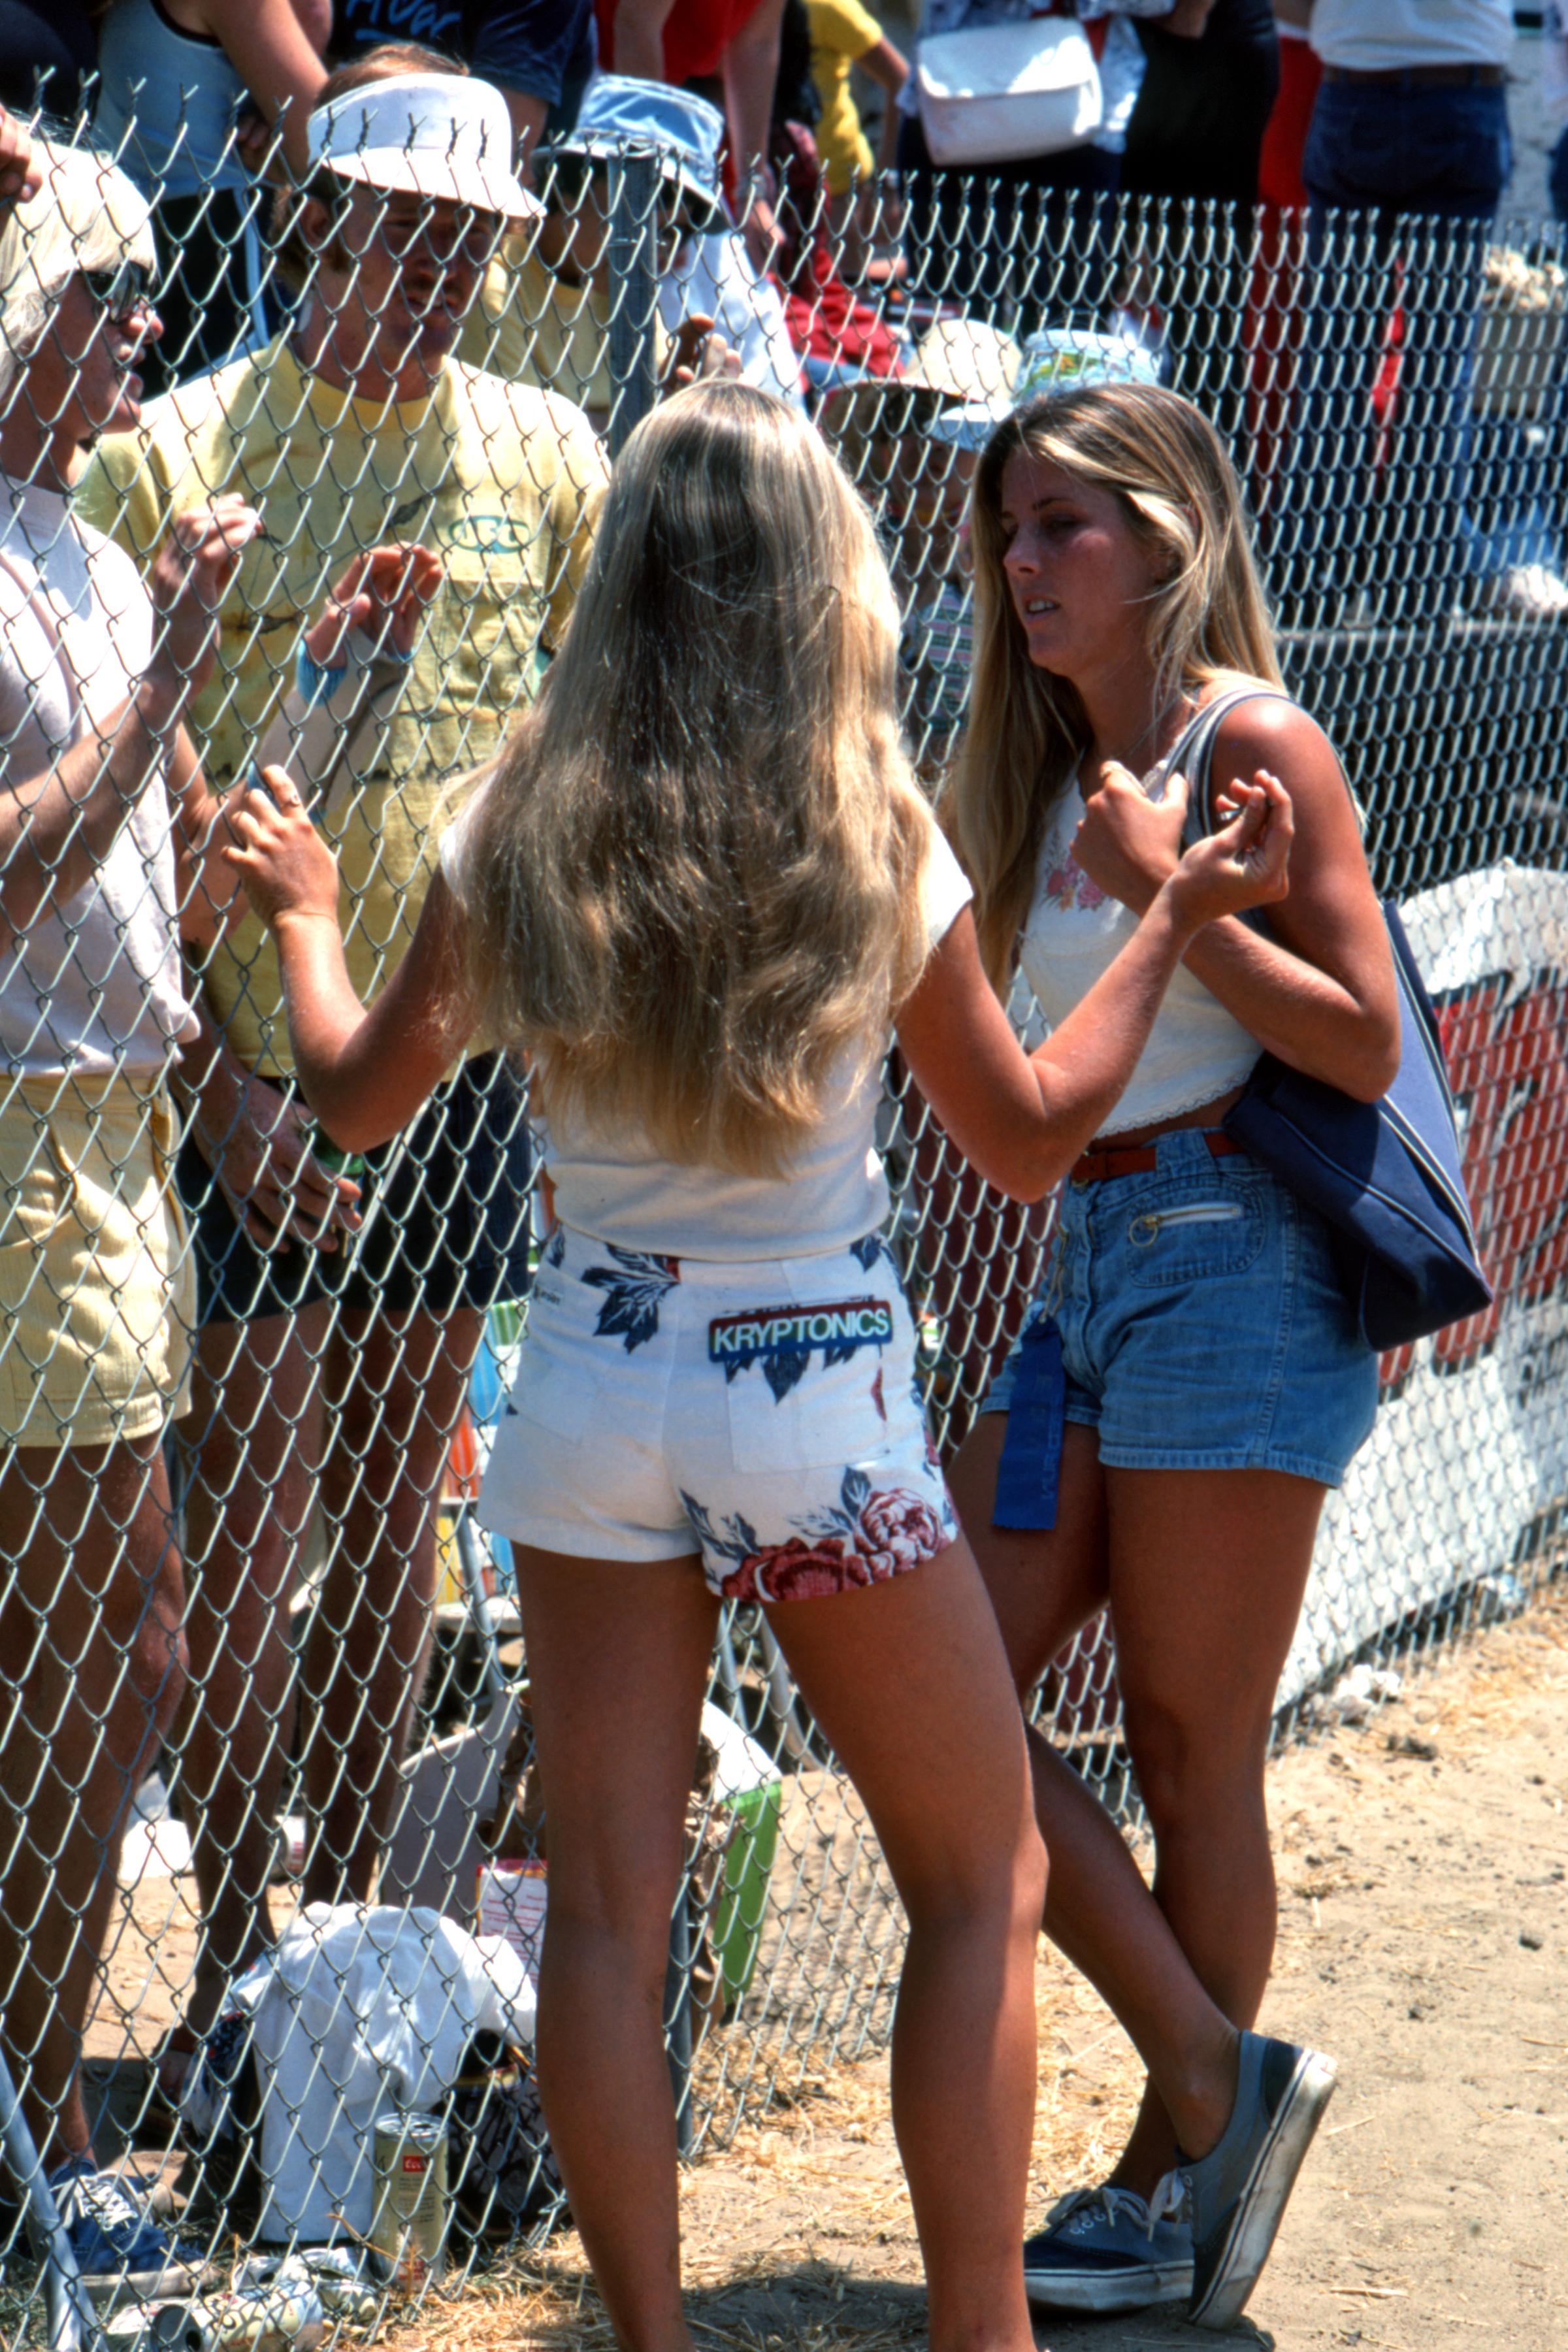 Signal Hill_Oneal_Vickers_Jun-1978.jpg